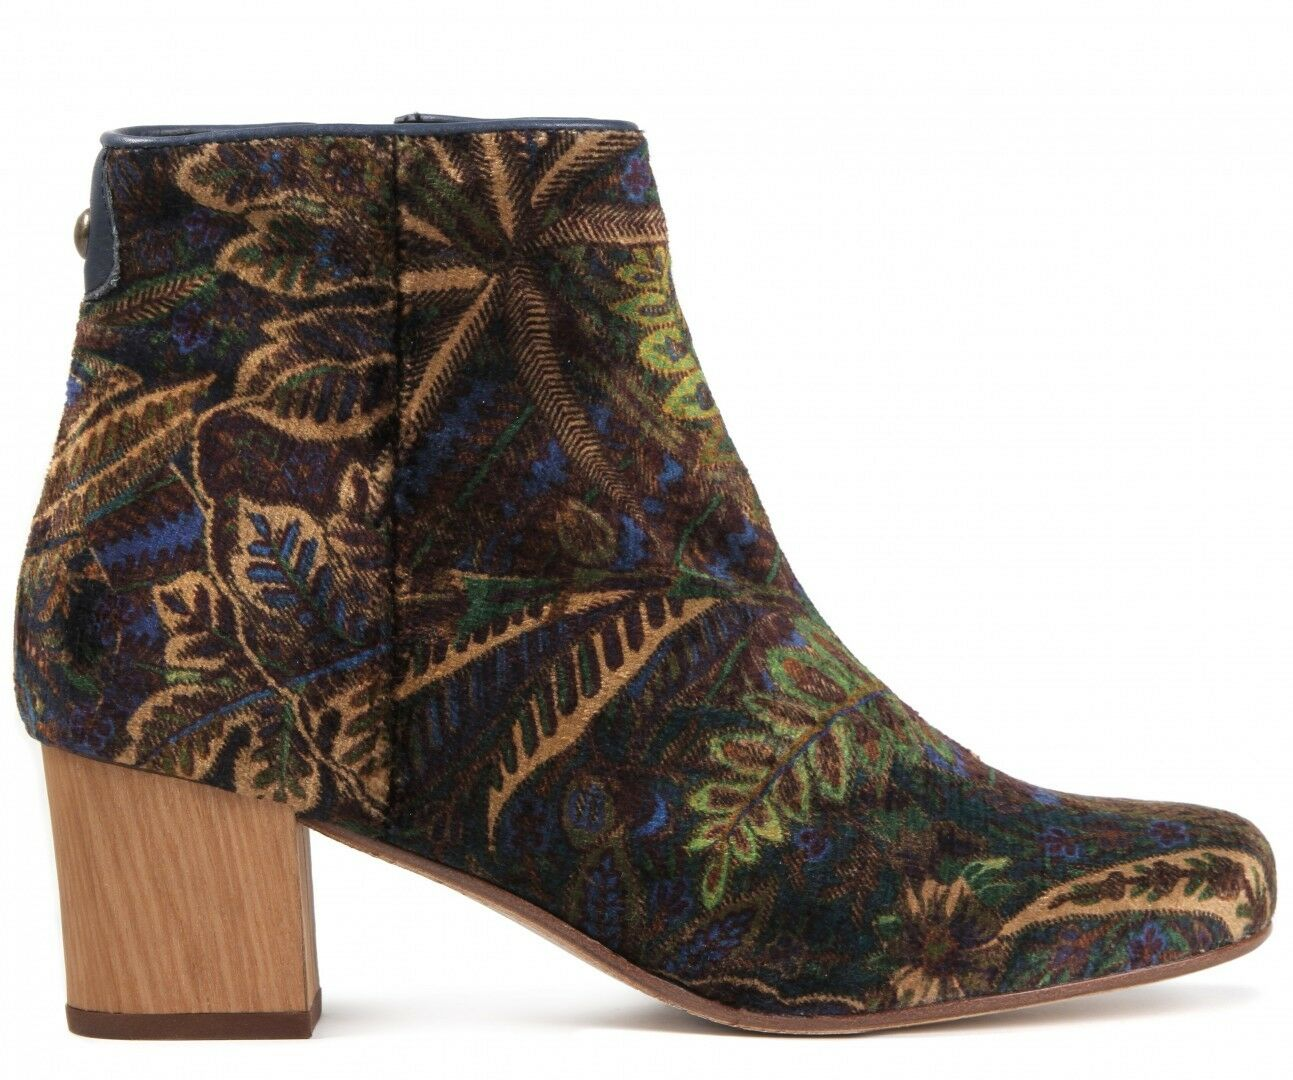 H By Hudson Garnett Versatile Velvet Liberty 3 Ankle Leder Schuhes Stiefel 3 Liberty to 7 40 047aff